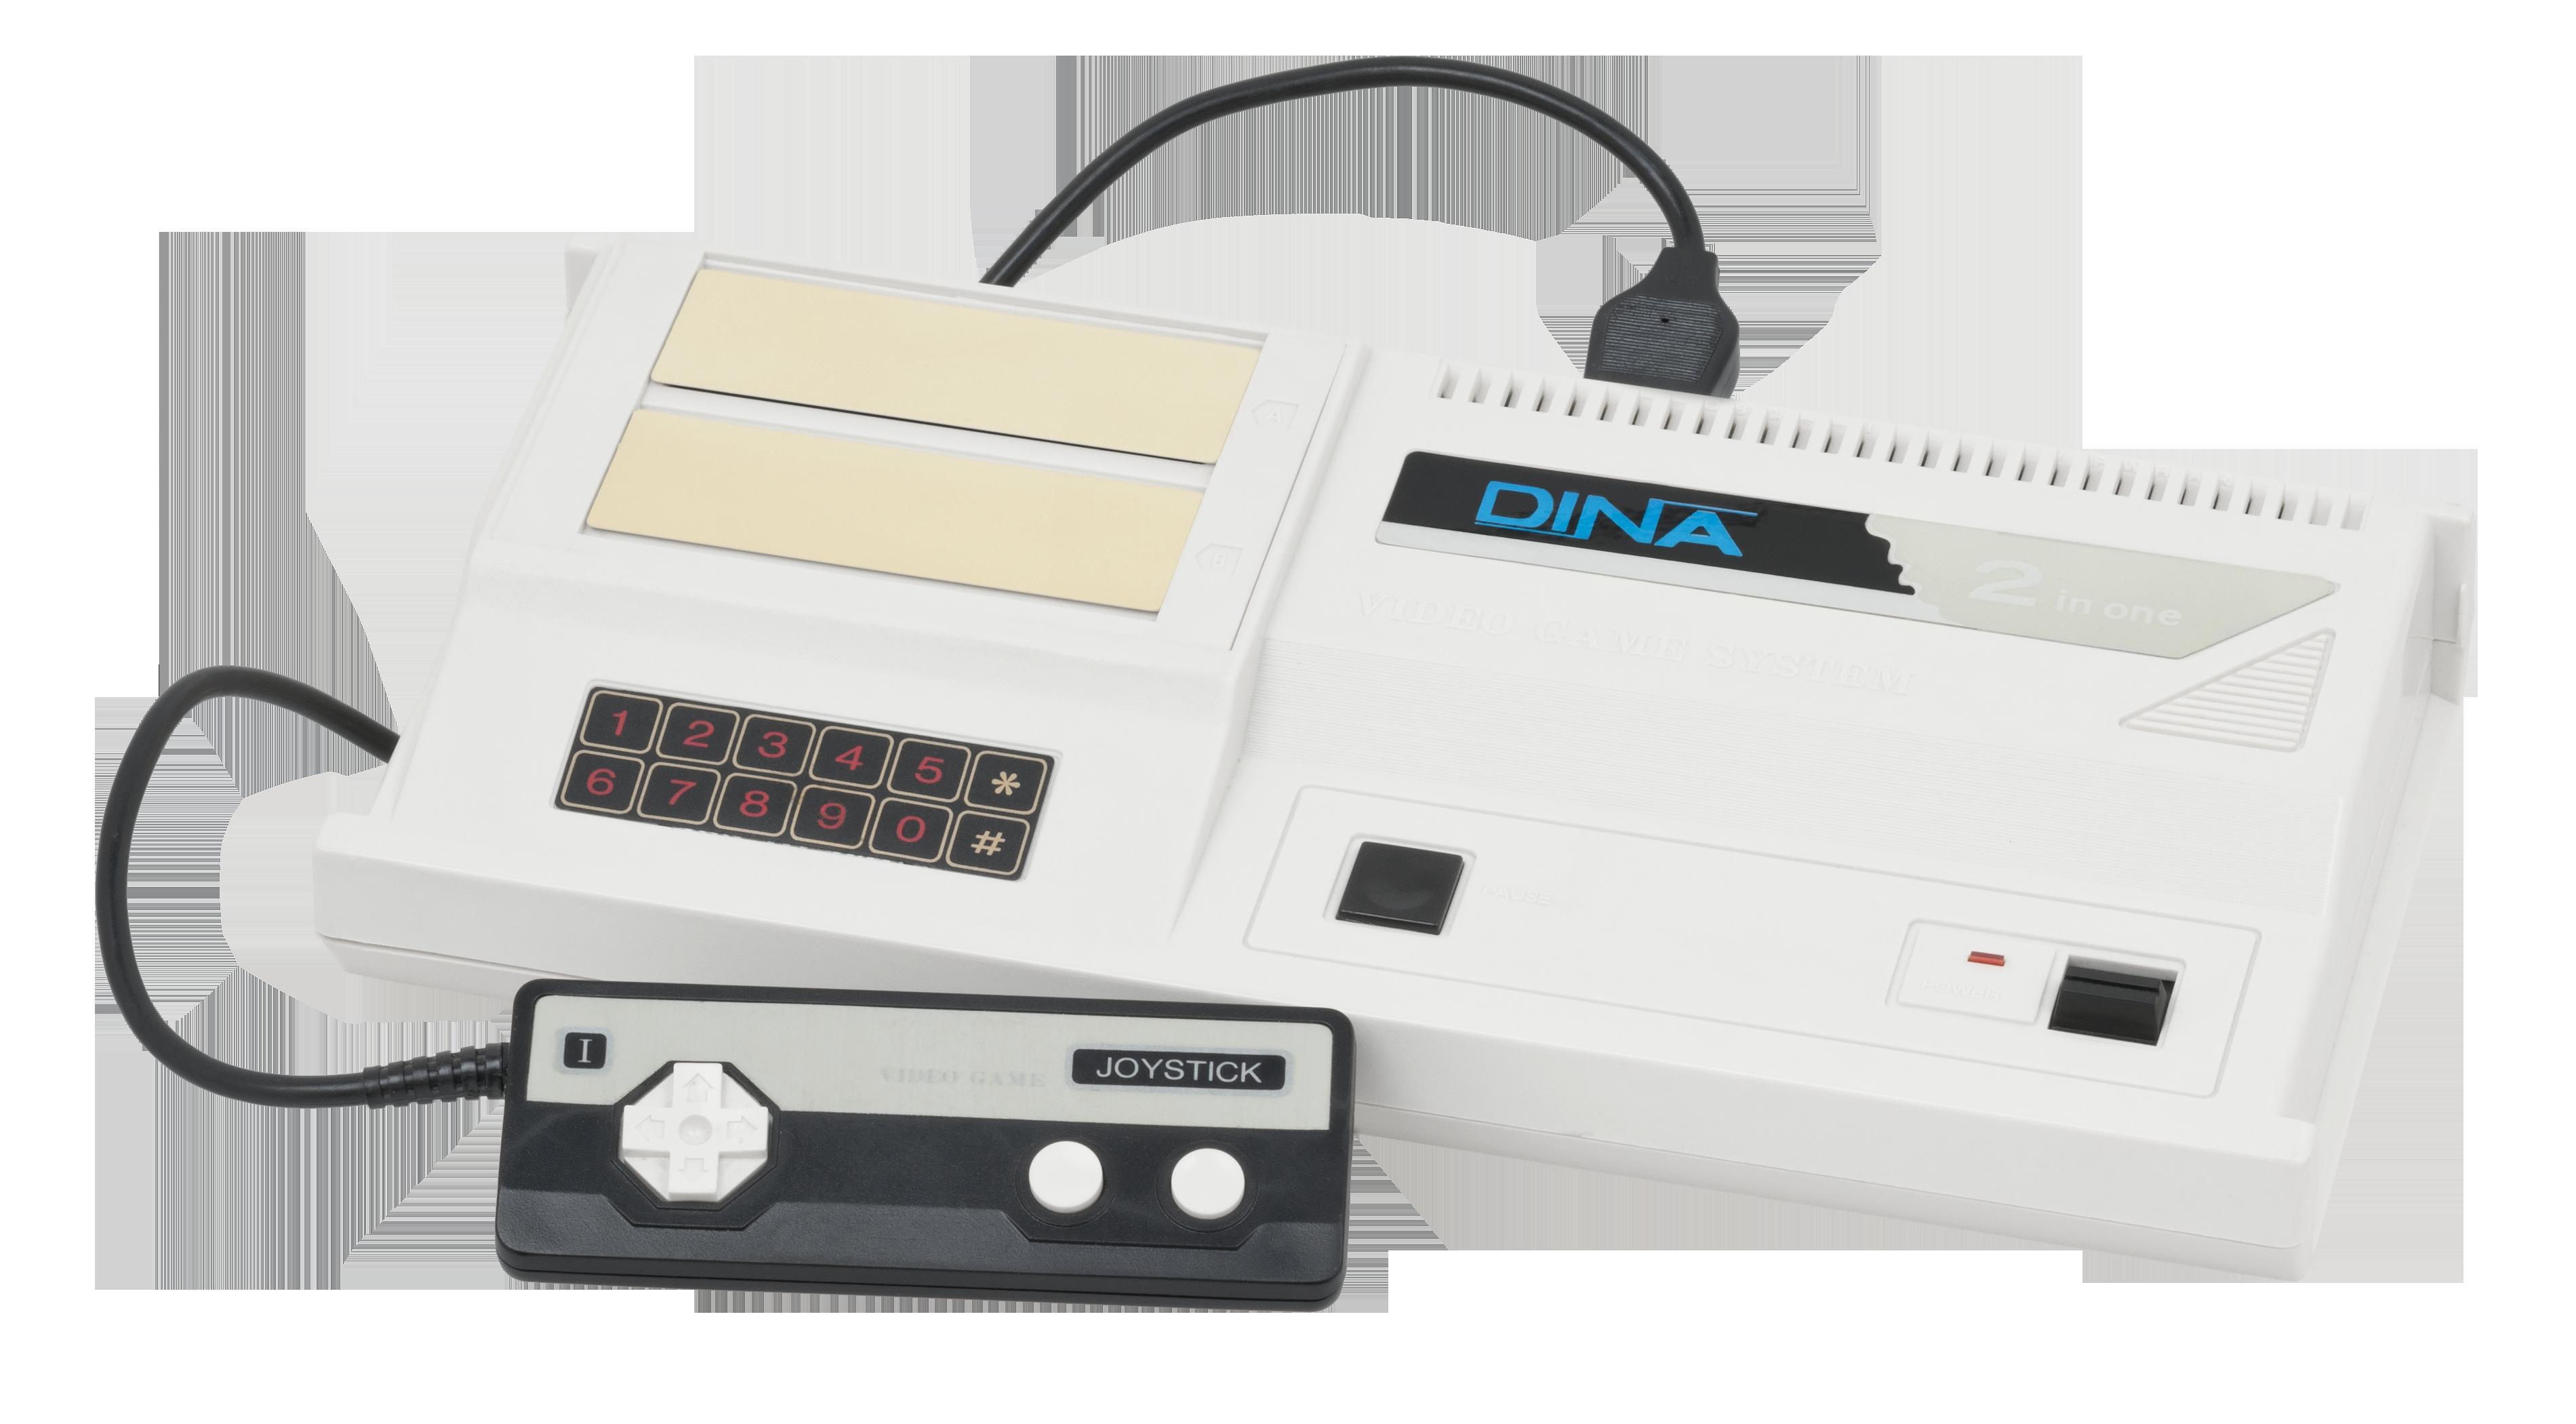 Dina (video game console) - Wikipedia